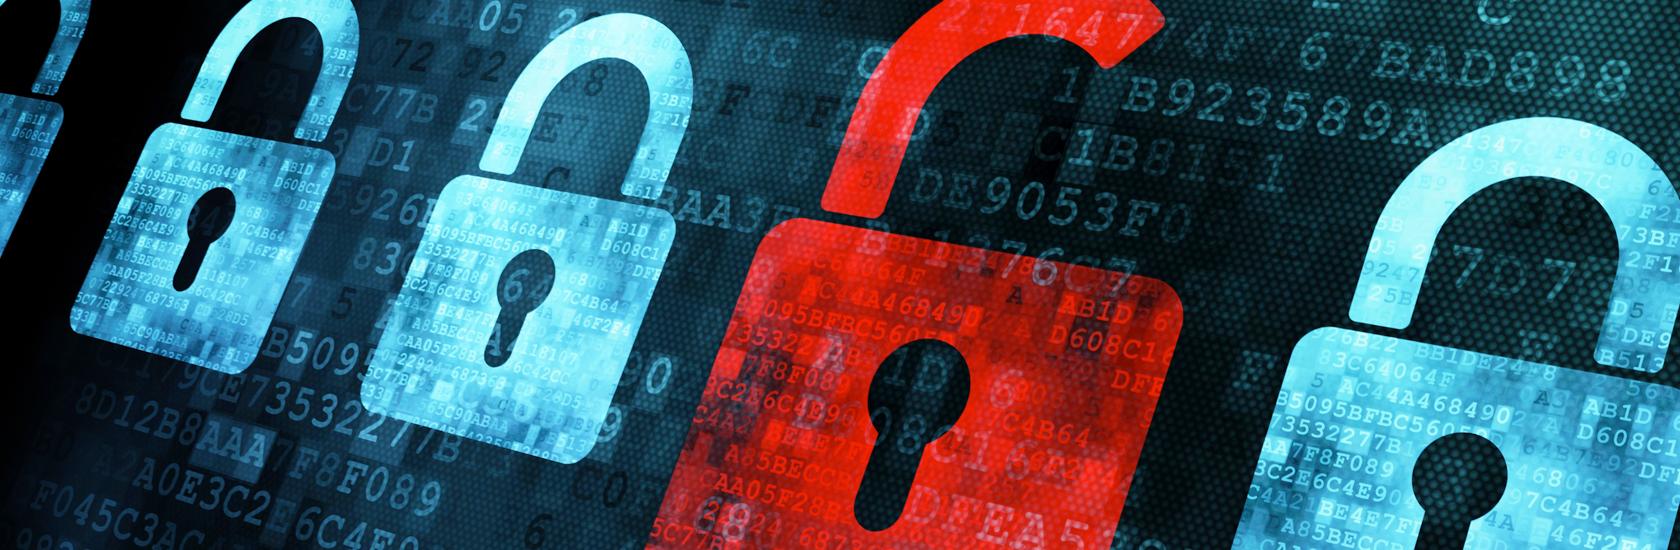 sicurezza-informatica-slider05